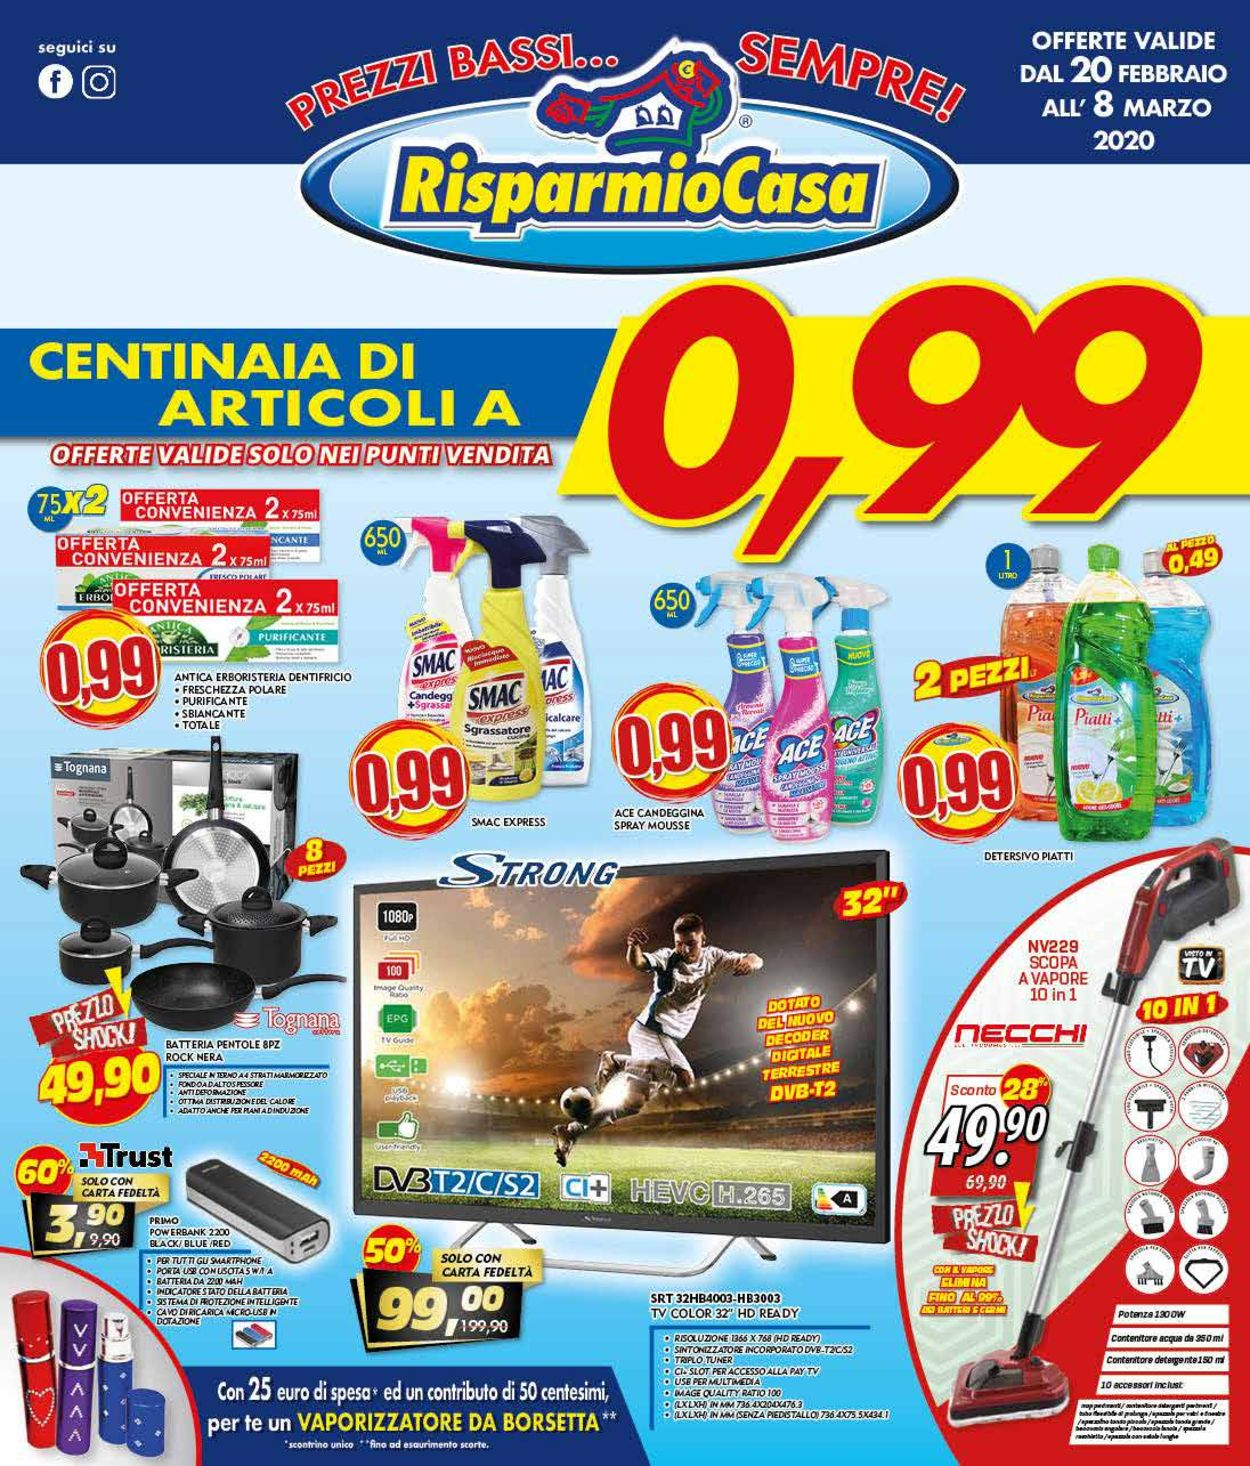 Volantino Risparmio Casa - Offerte 20/02-08/03/2020